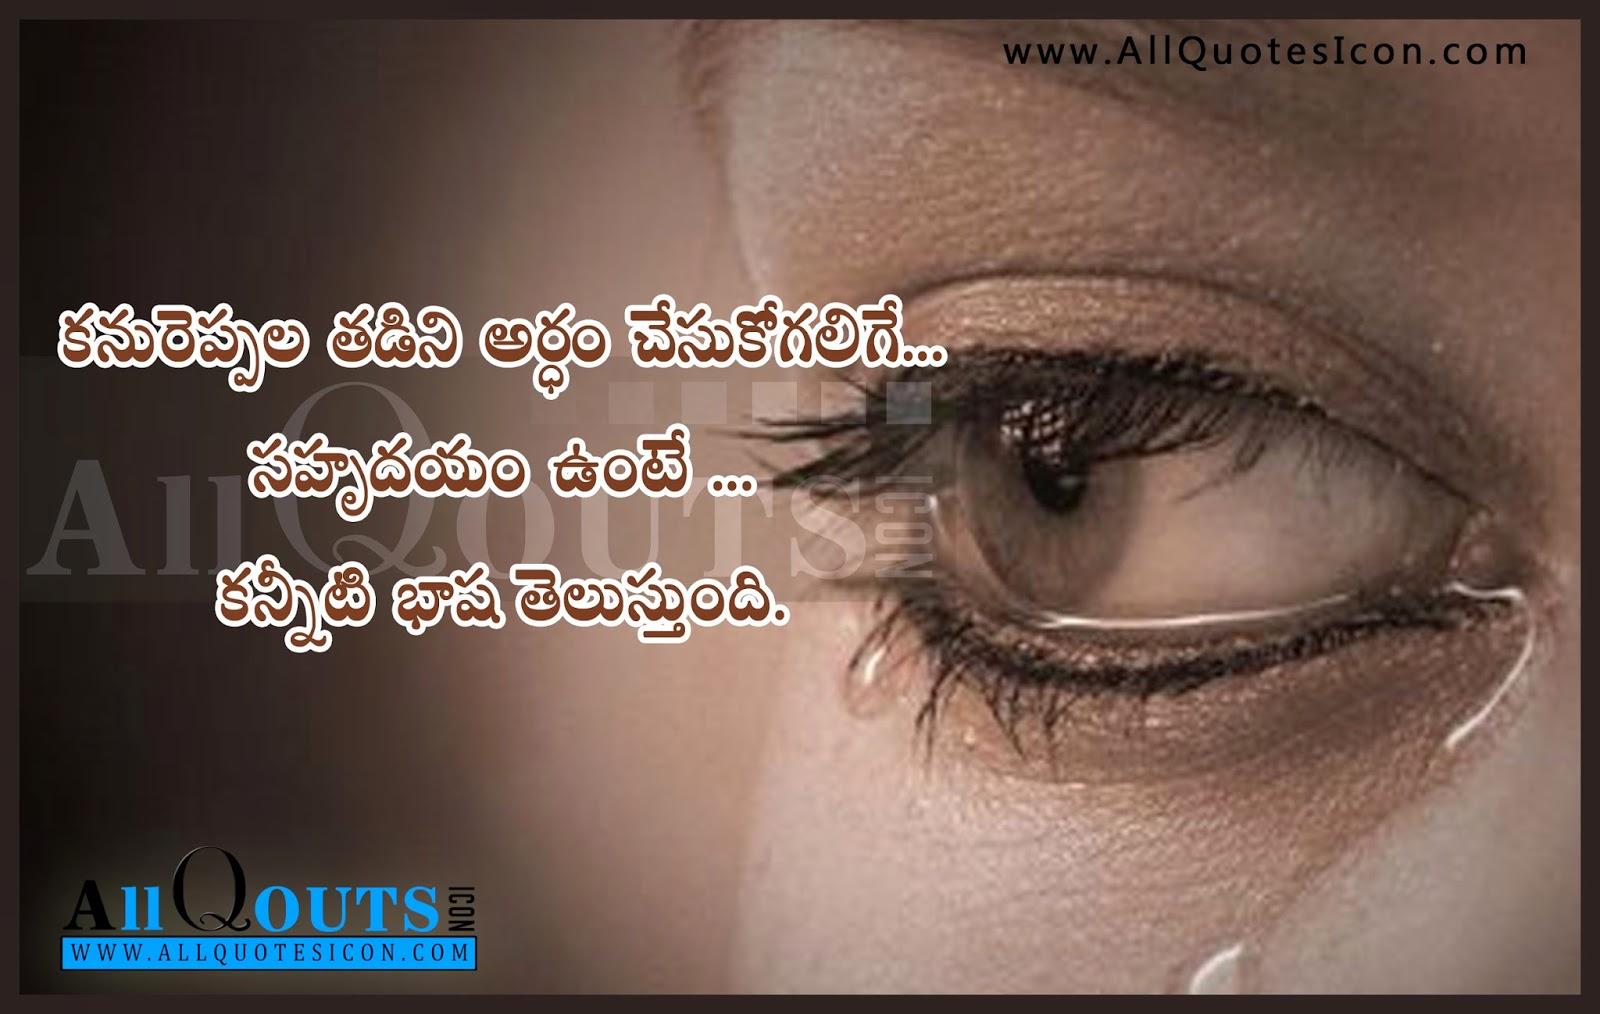 Telugu Sad Quotes and Feelings | WWW.ALLQUOTESICON.COM